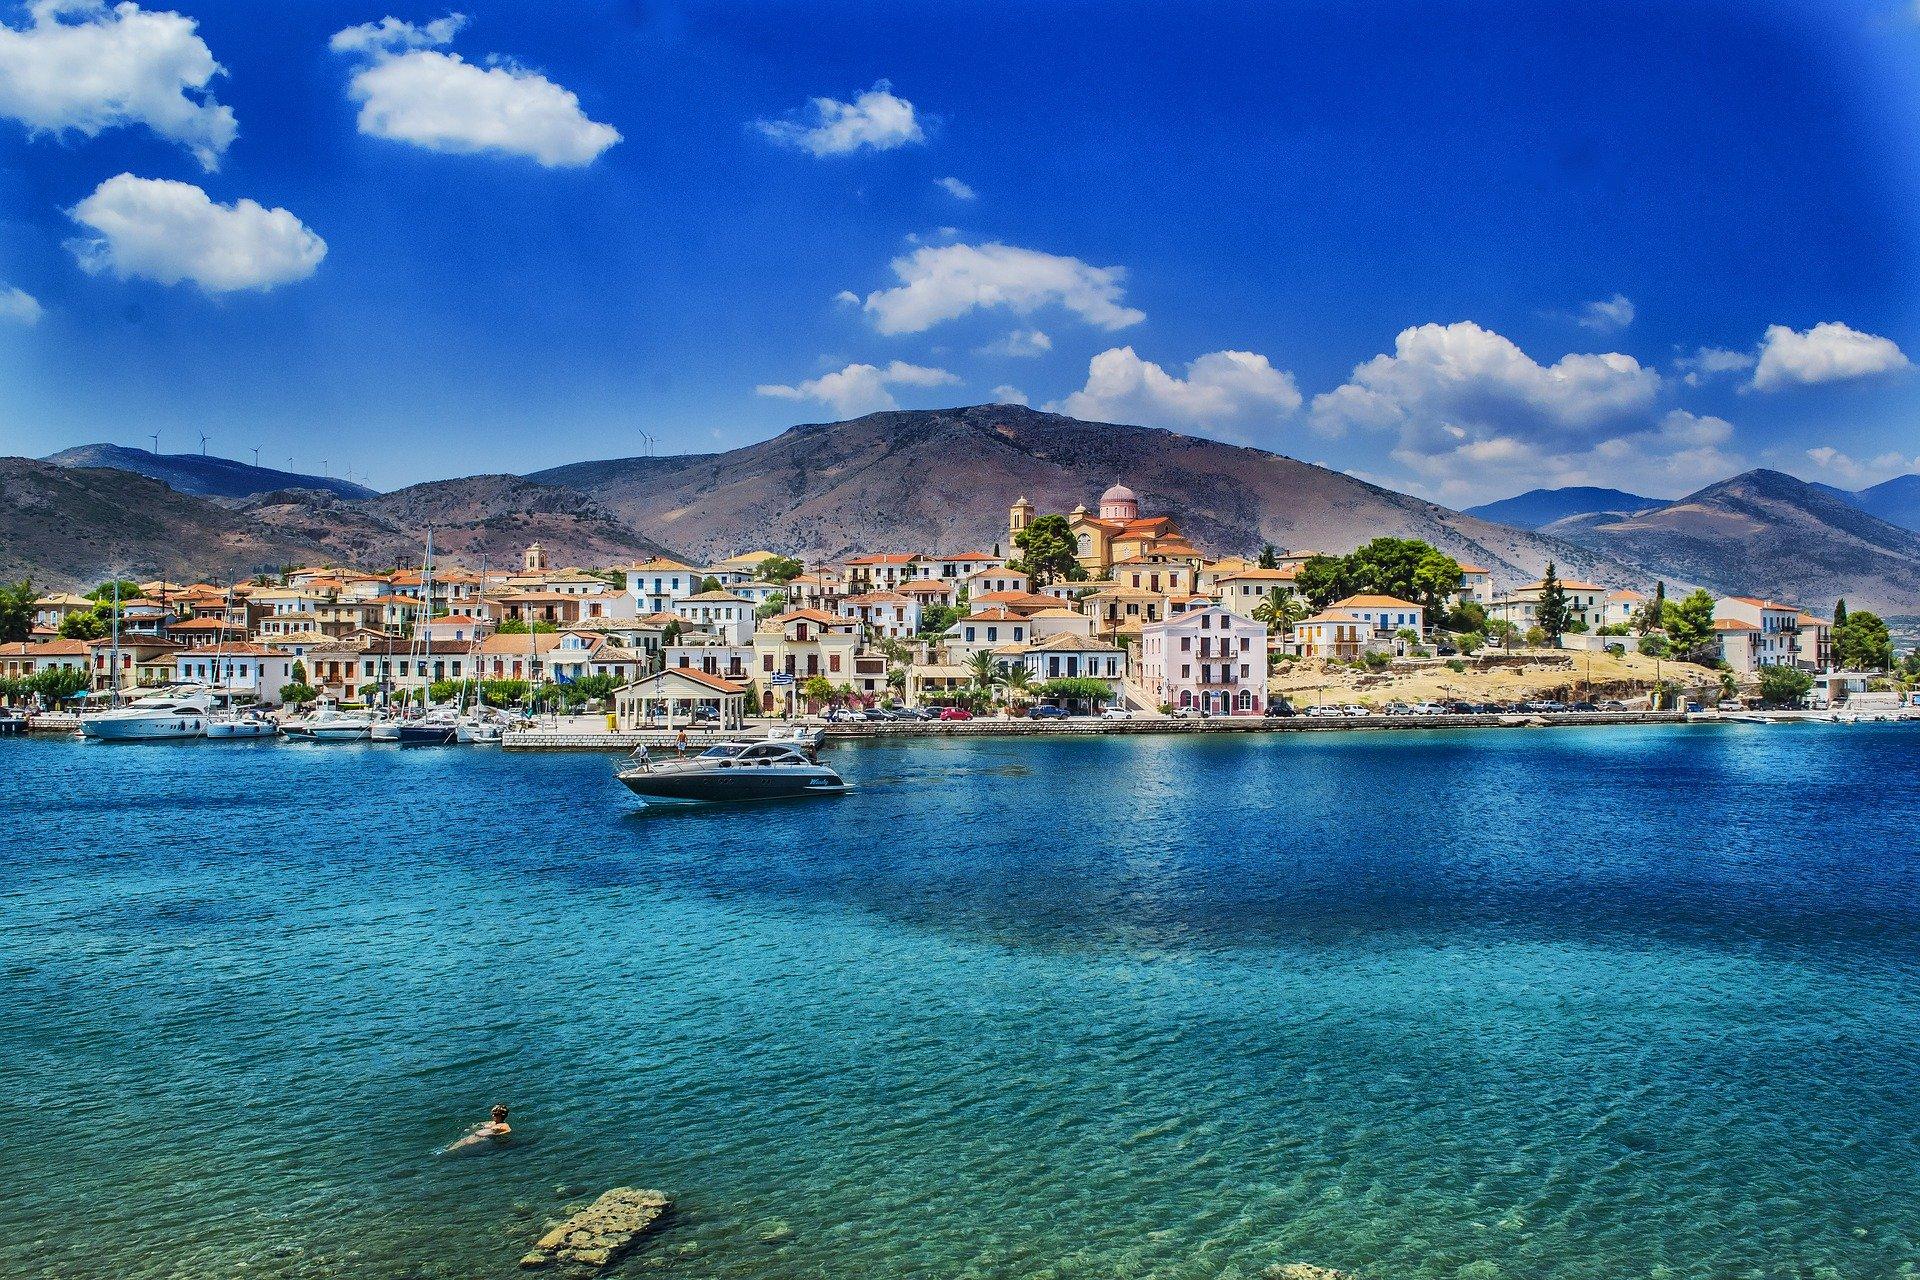 Walking Trips for Women to Greece